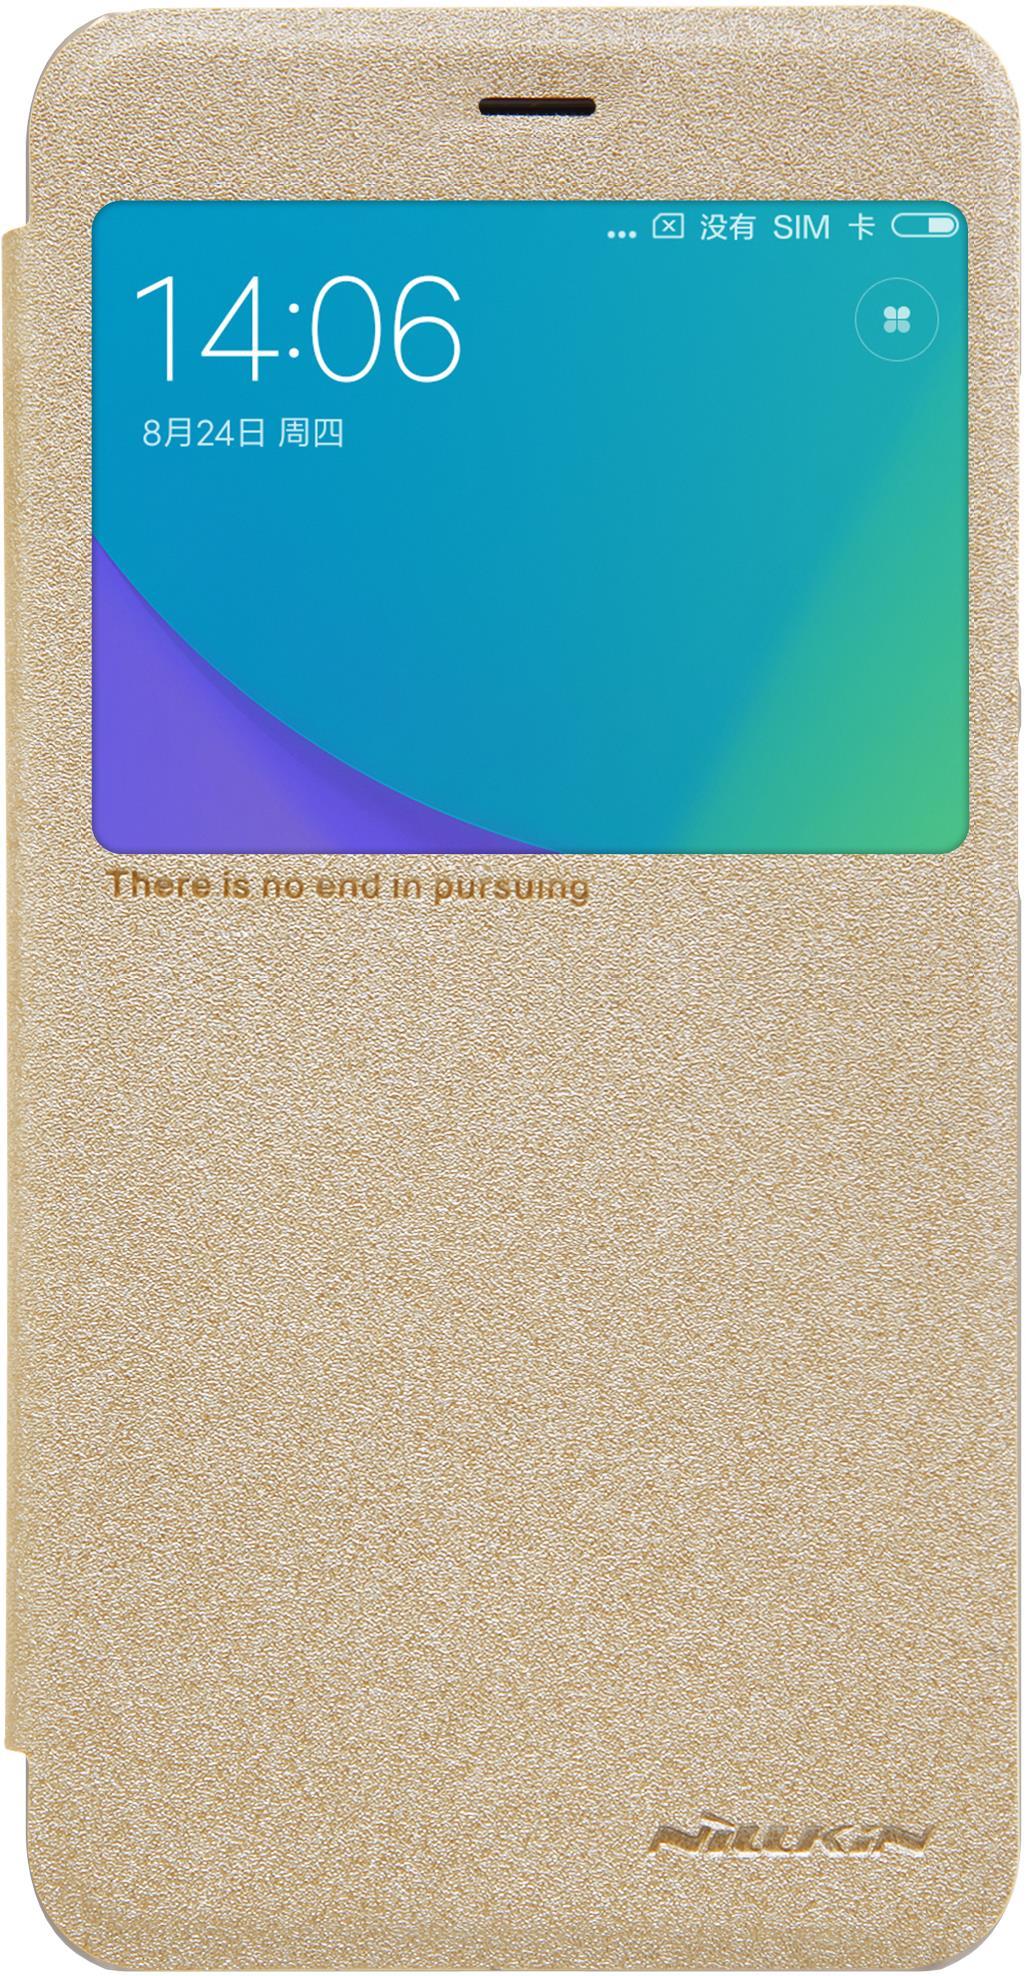 Чехол-книжка Nillkin Sparkle для Xiaomi Redmi Note 5A Prime, 6902048148673, золотистый чехол книжка nillkin sparkle для xiaomi redmi note 5a prime gold